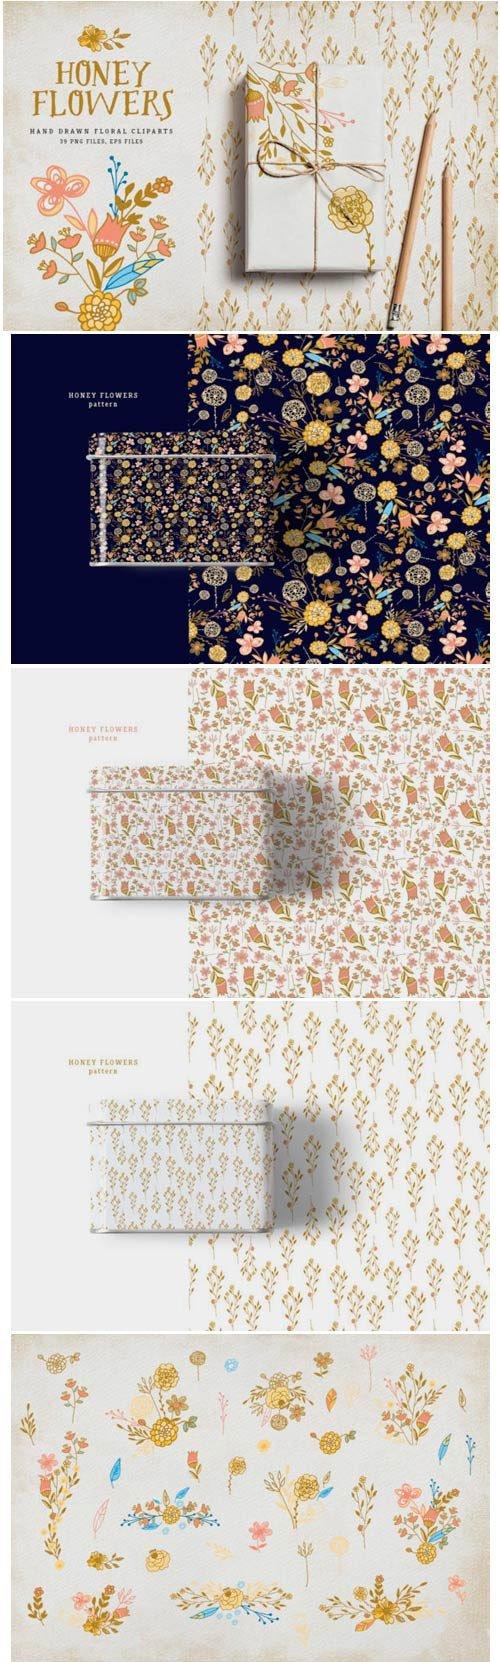 Honey Flowers 1562054